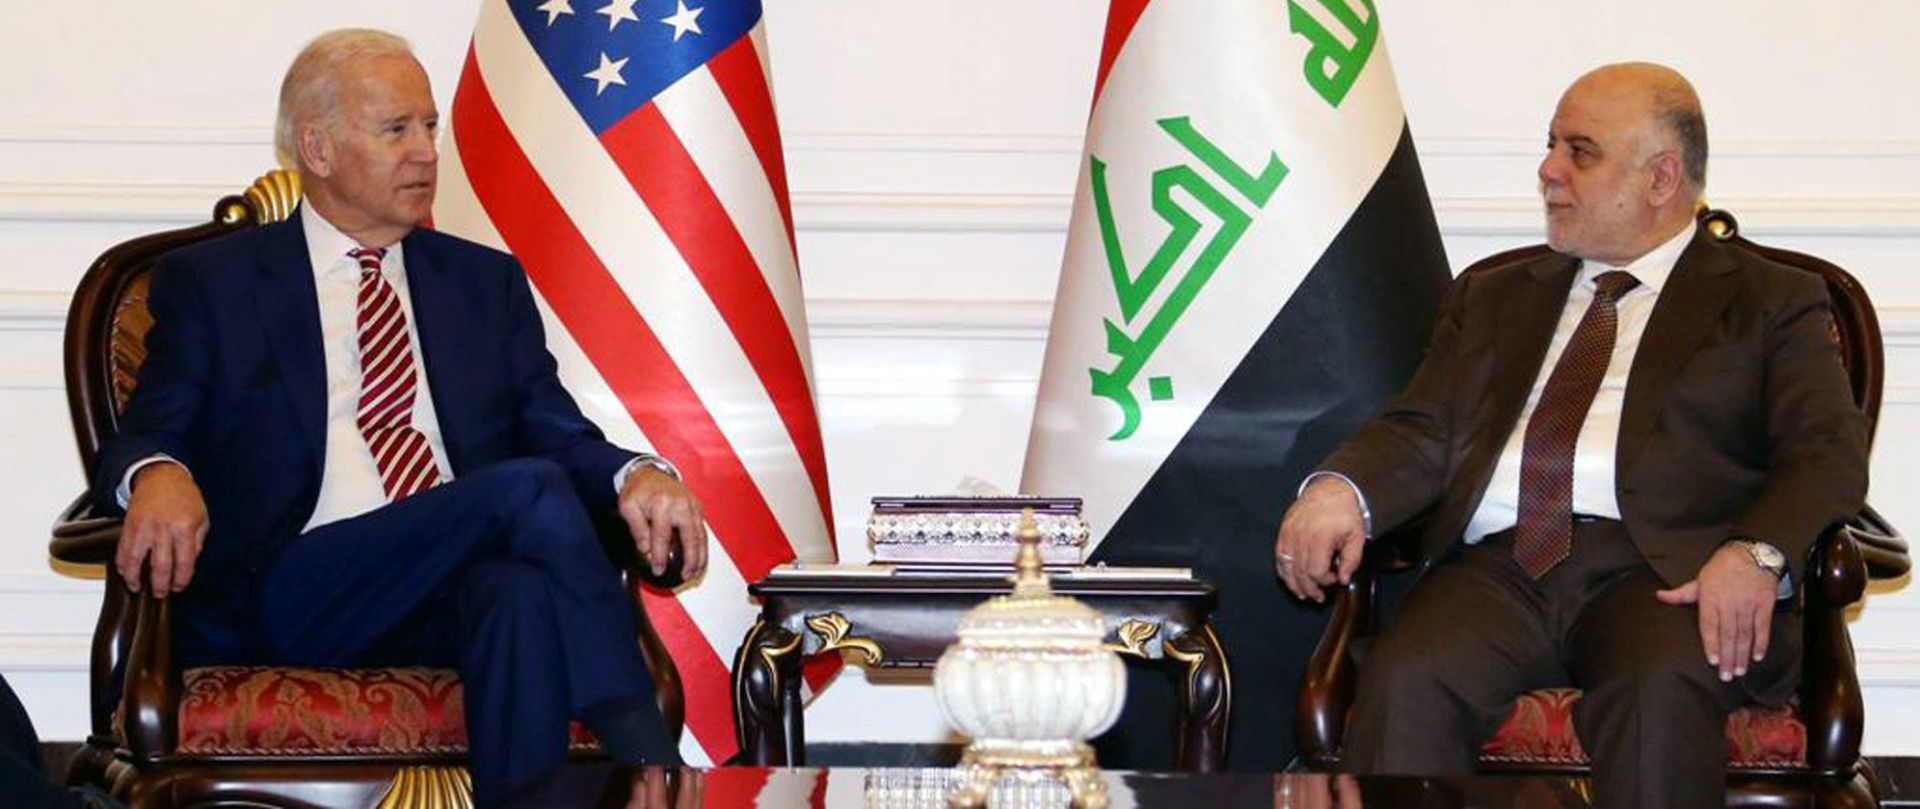 POTPORA VLADI: Joe Biden stigao u nenajavljeni posjet Bagdadu